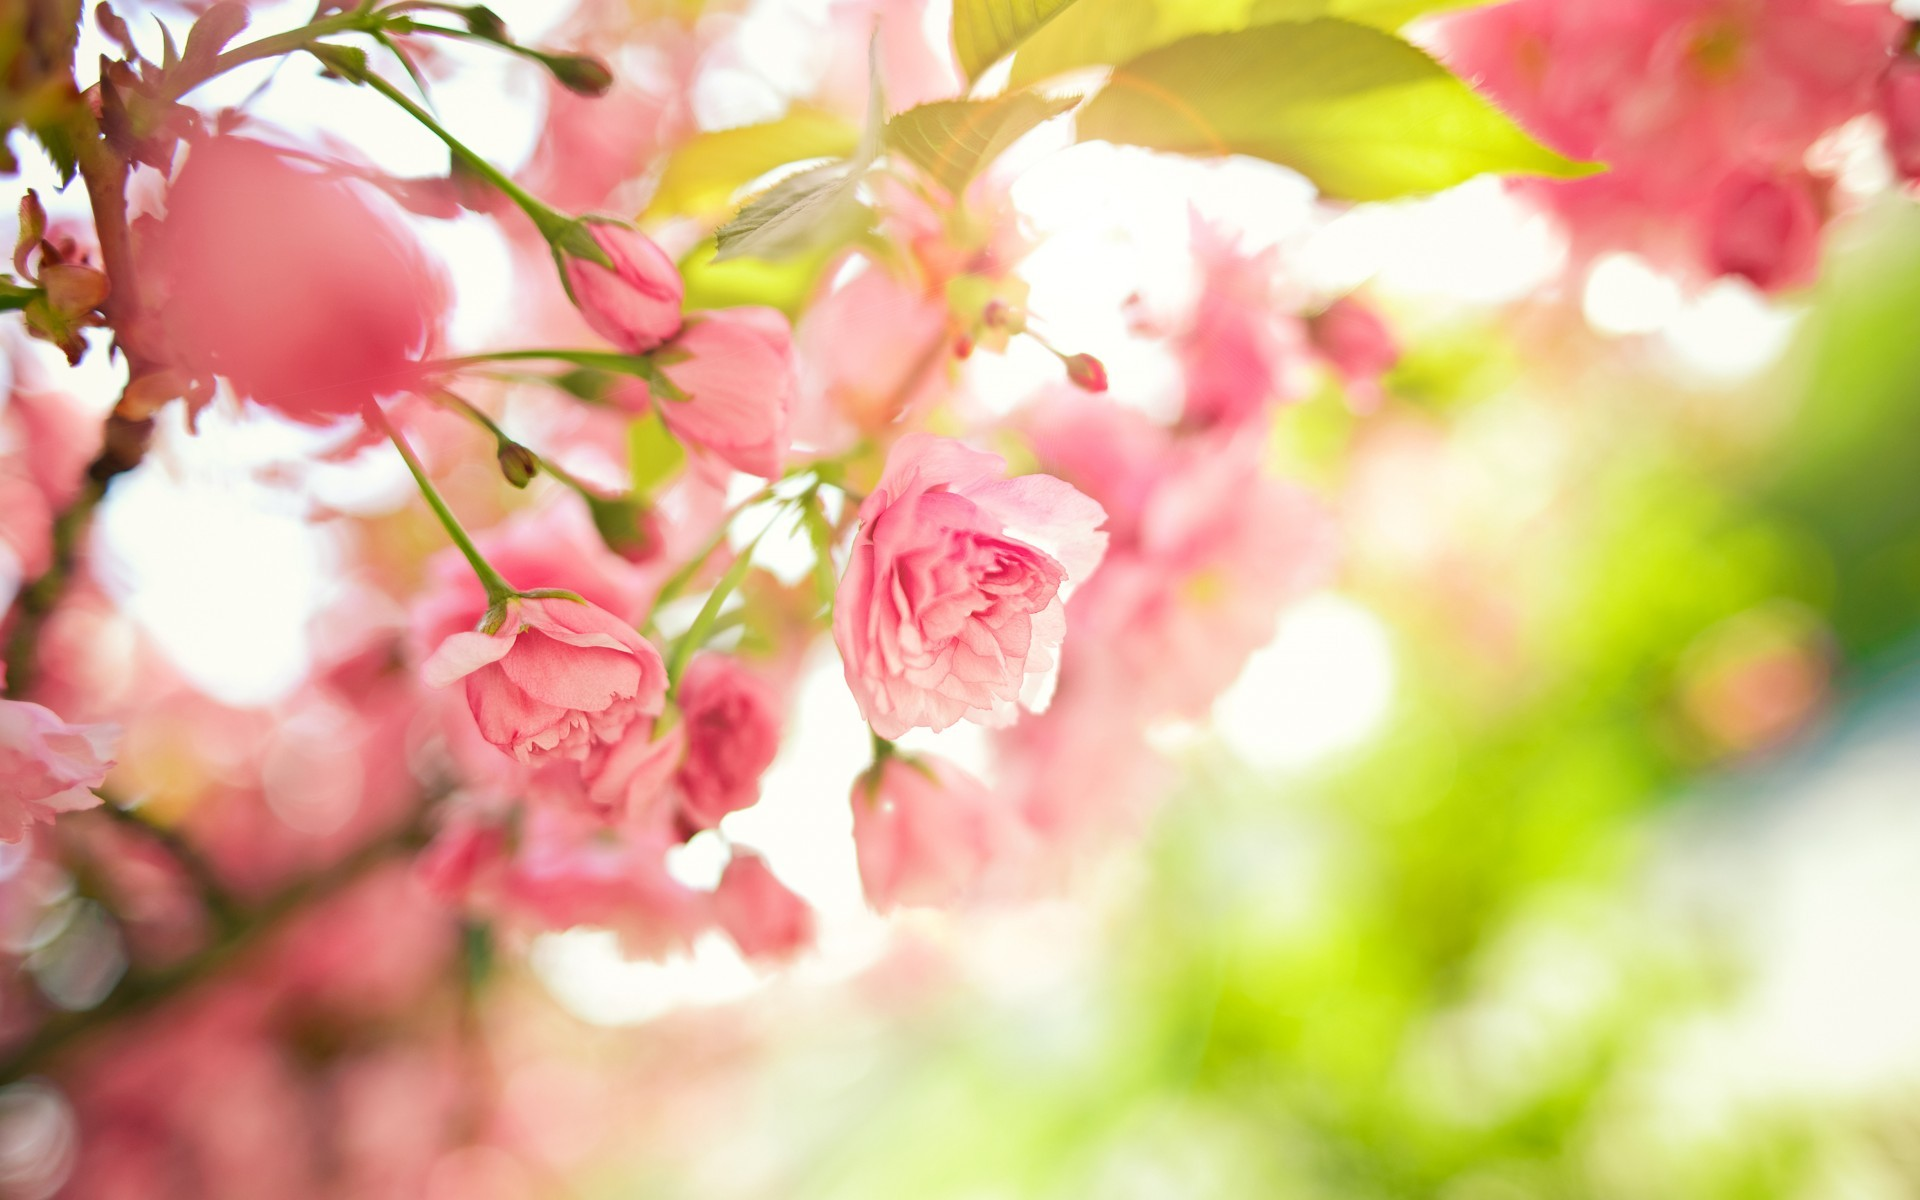 Spring flowers wallpaper download free beautiful high resolution spring flowers wallpaper 2560x1440 large resolution 2560x1440 spring flowers wallpaper 2560x1440 large resolution mightylinksfo